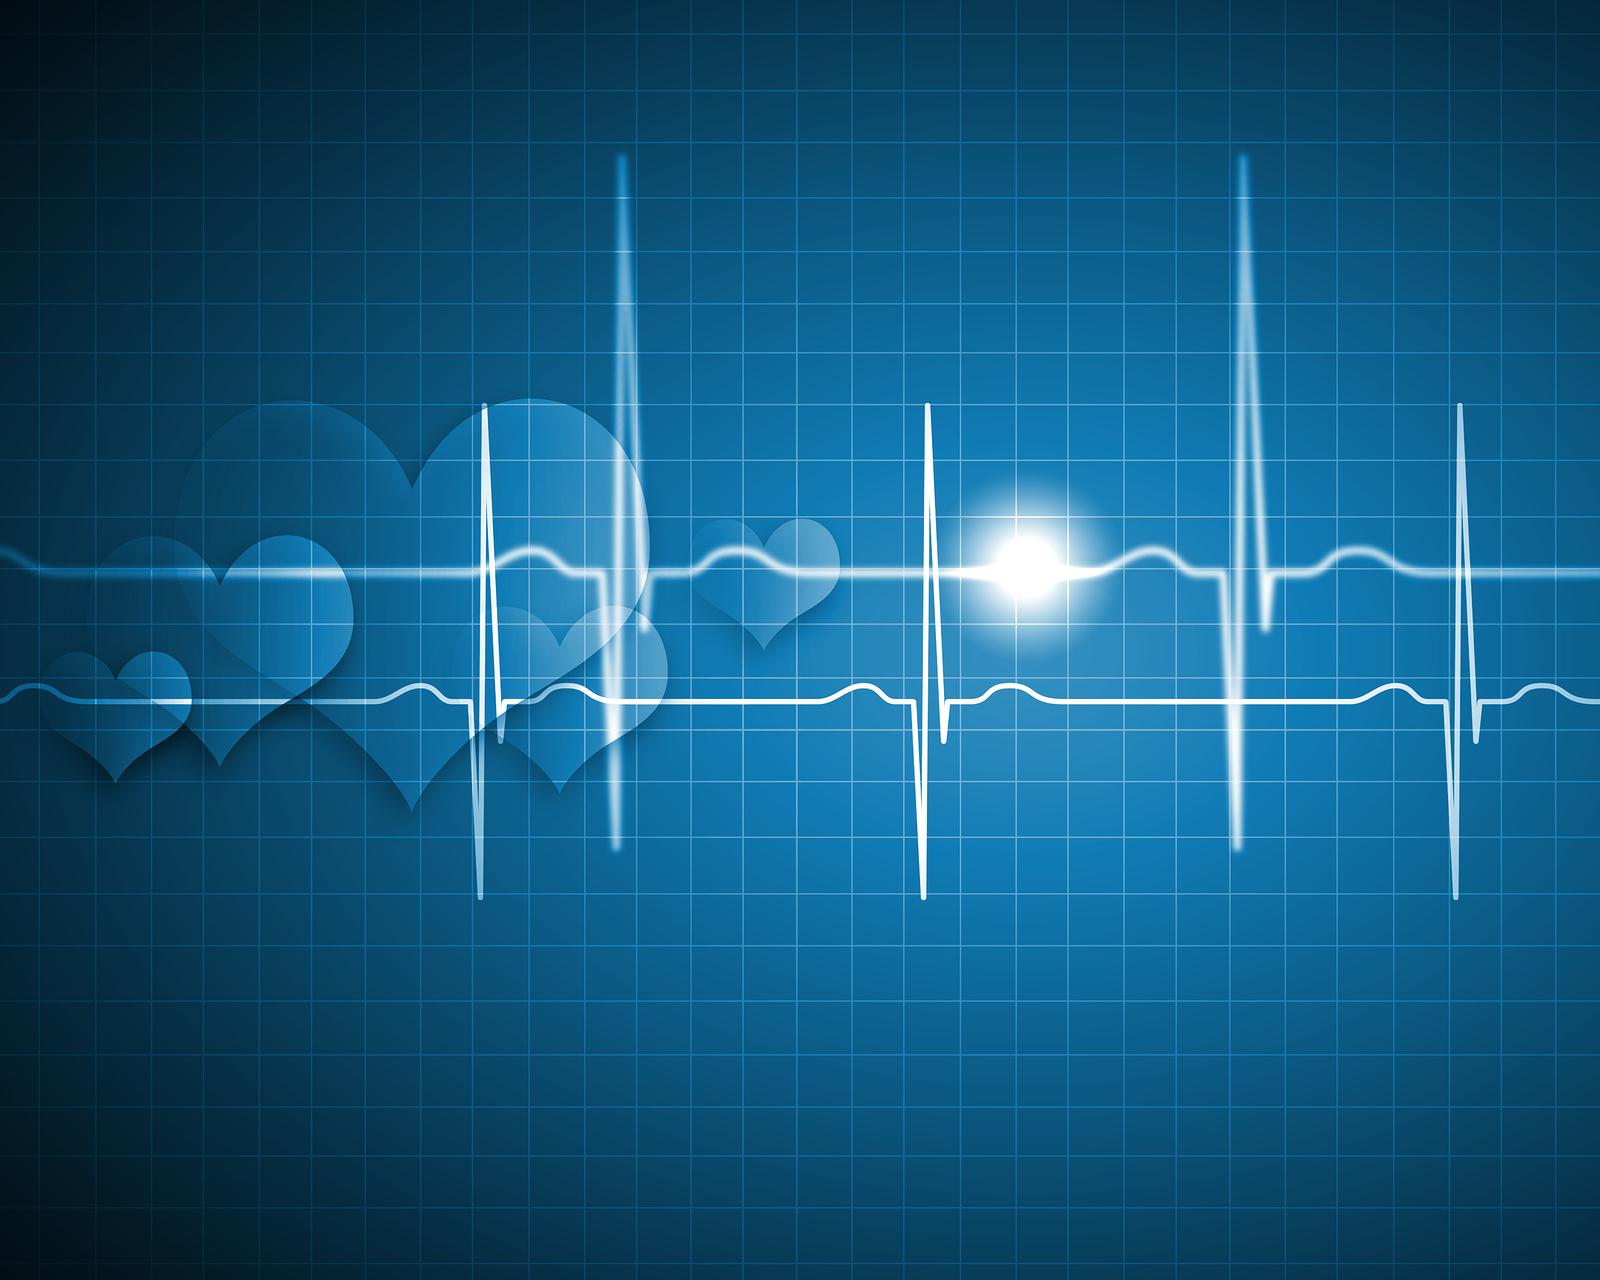 HeartRateVariabilityBiofeedback1.png